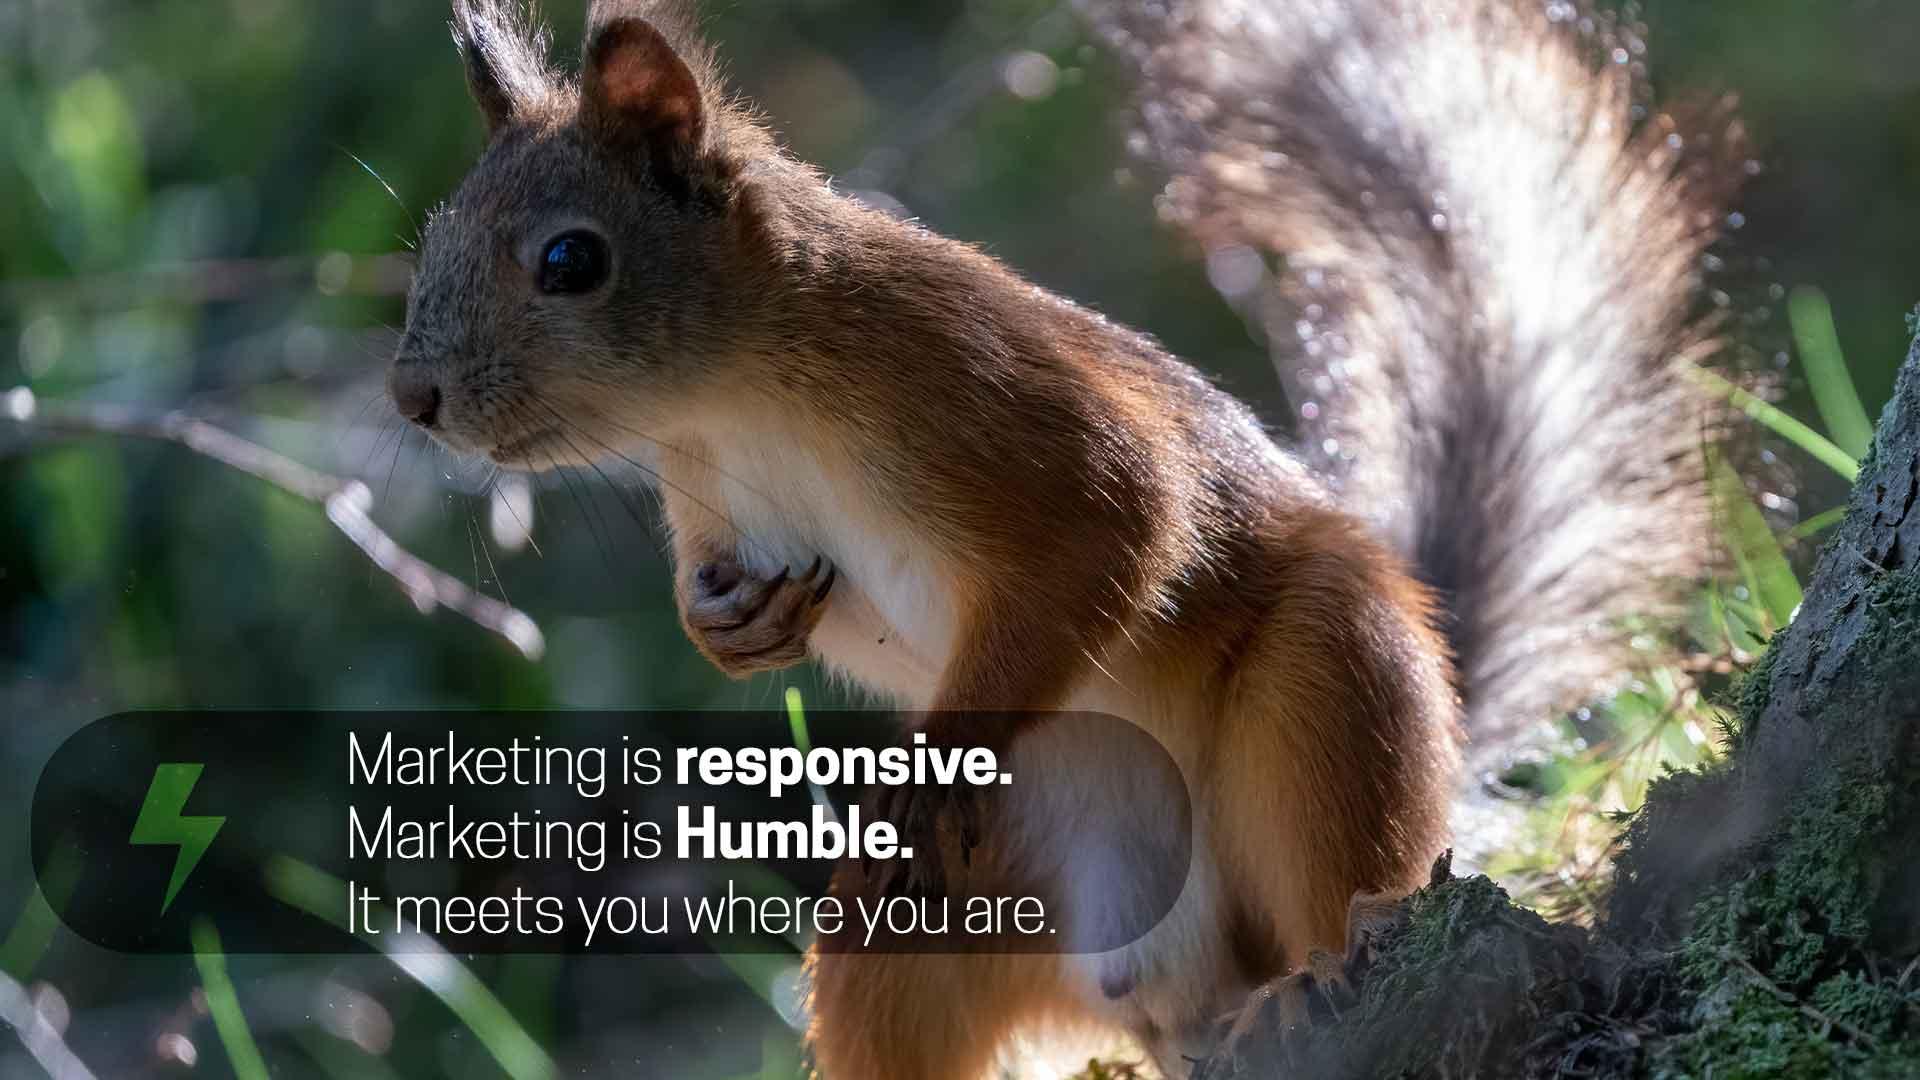 wakilisha-creative-enterprise-marketing-is-responsive.-Marketing-is-humble